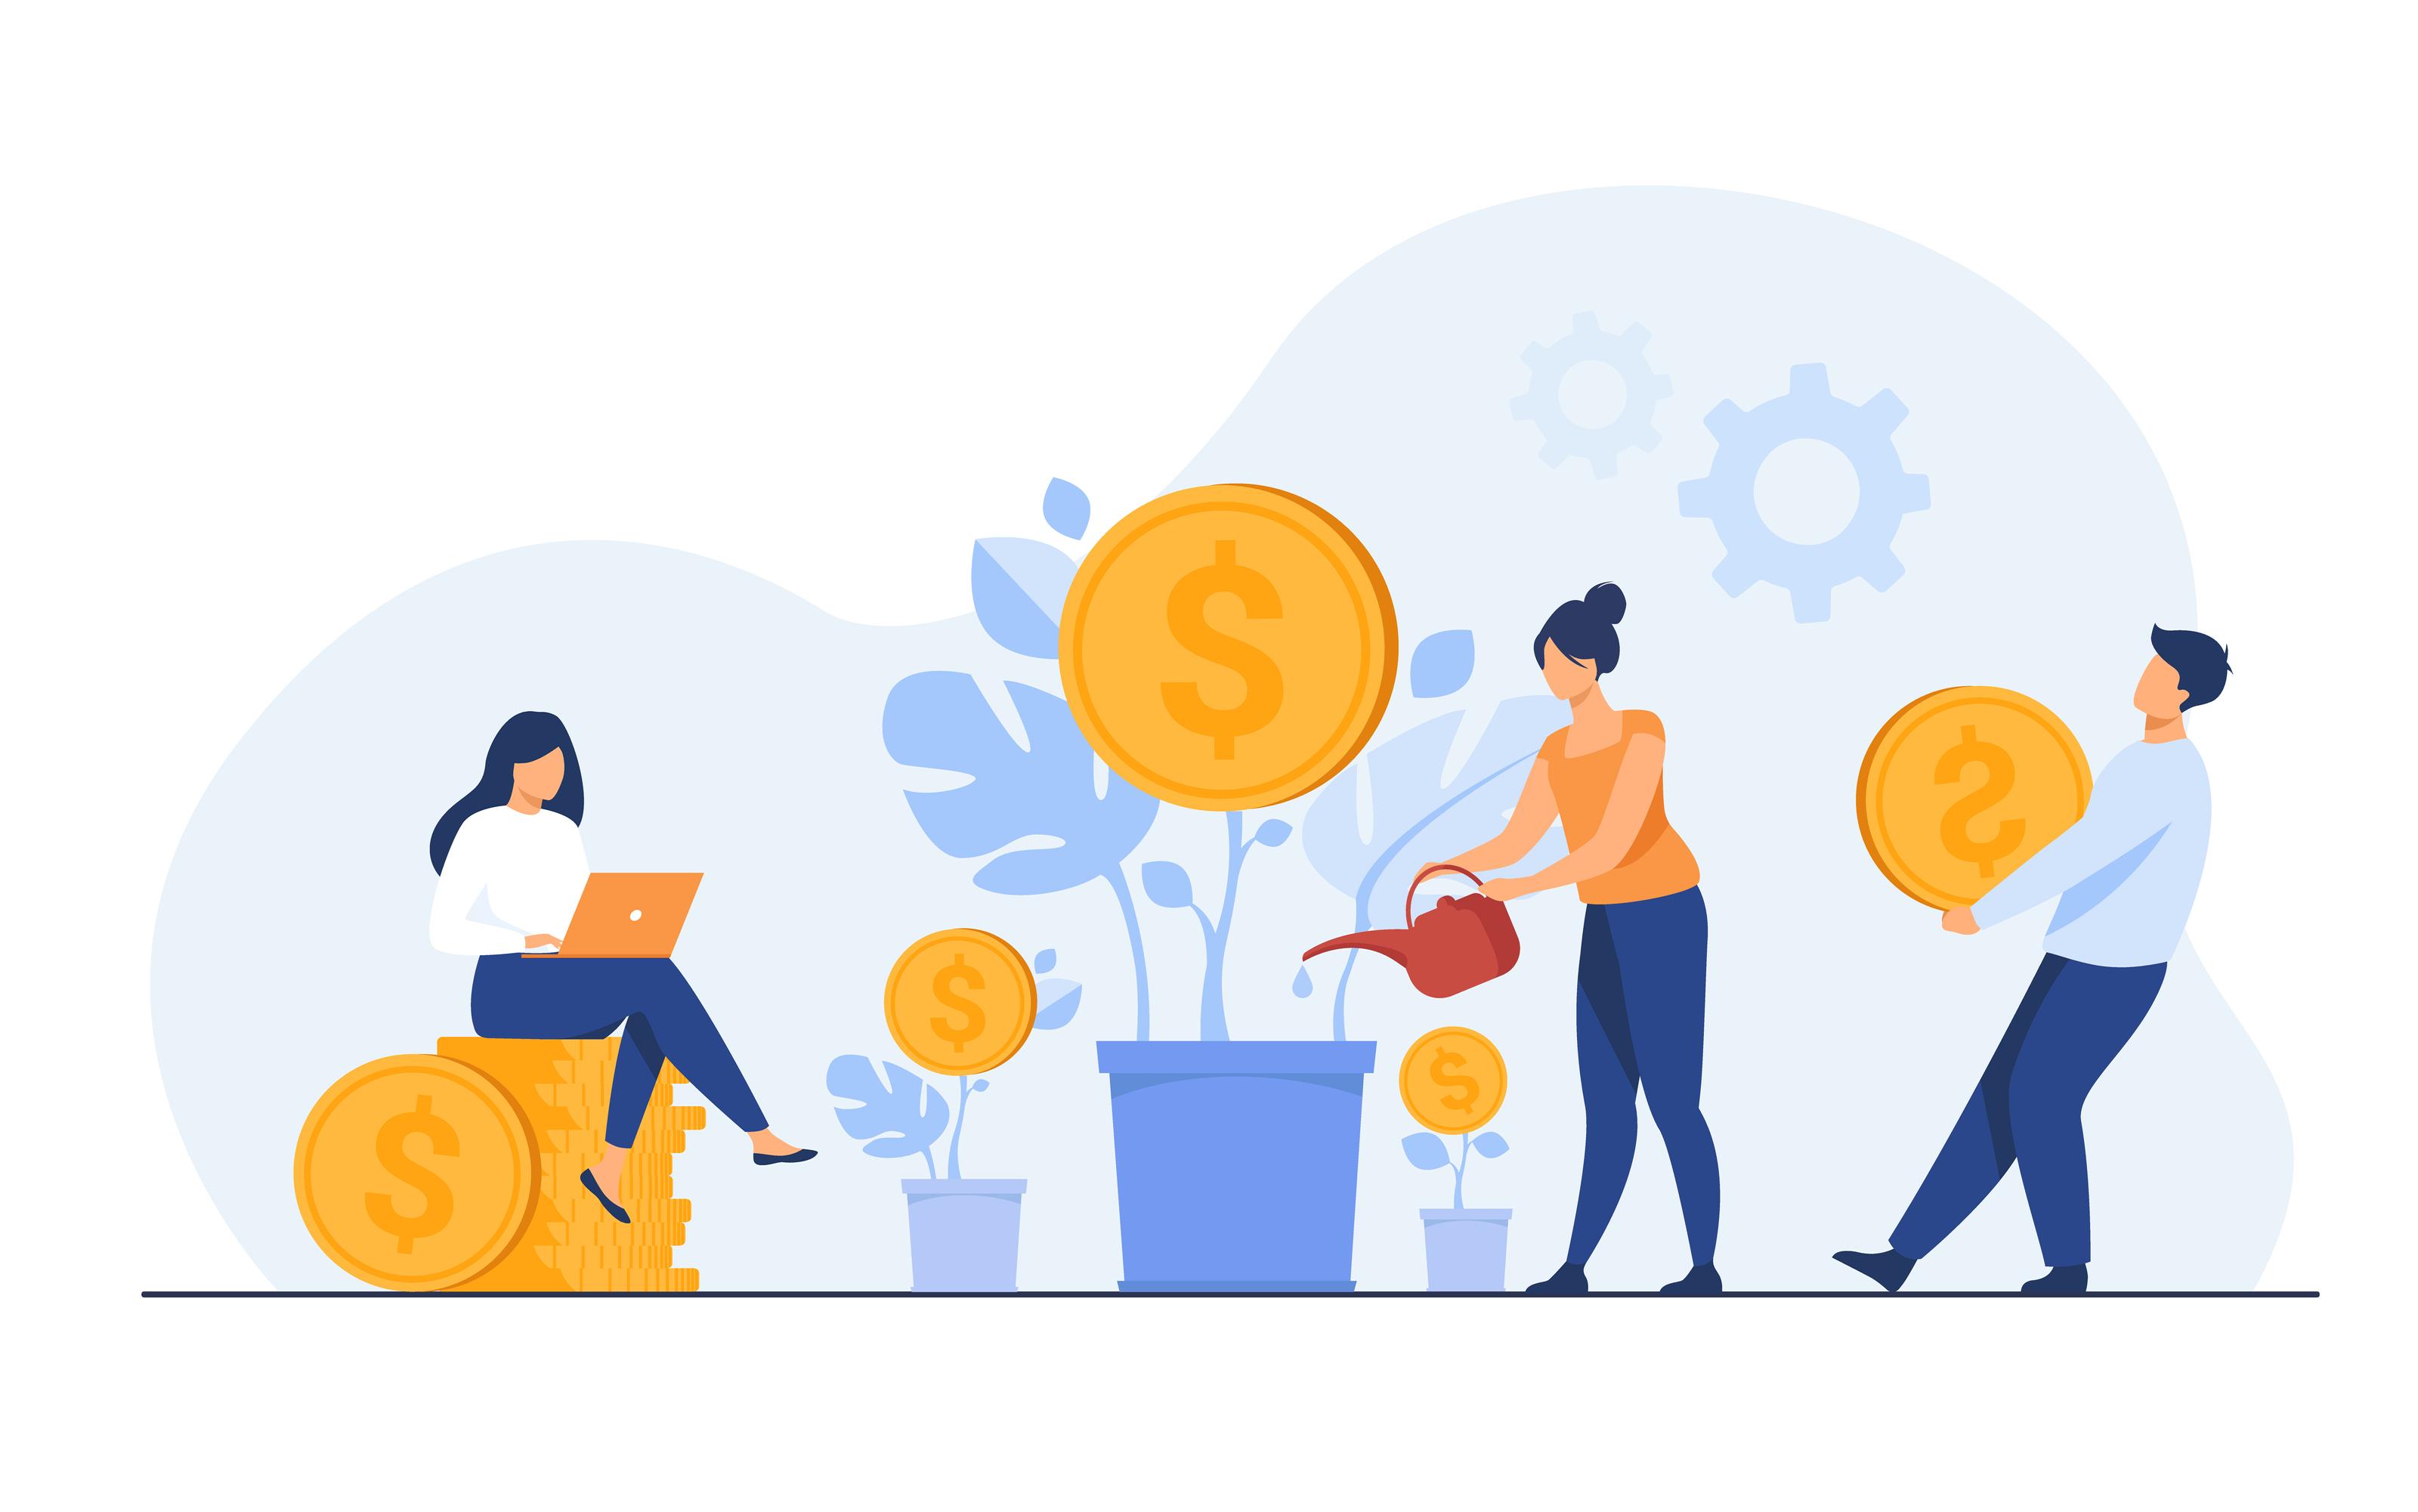 Vector illustration on budgeting